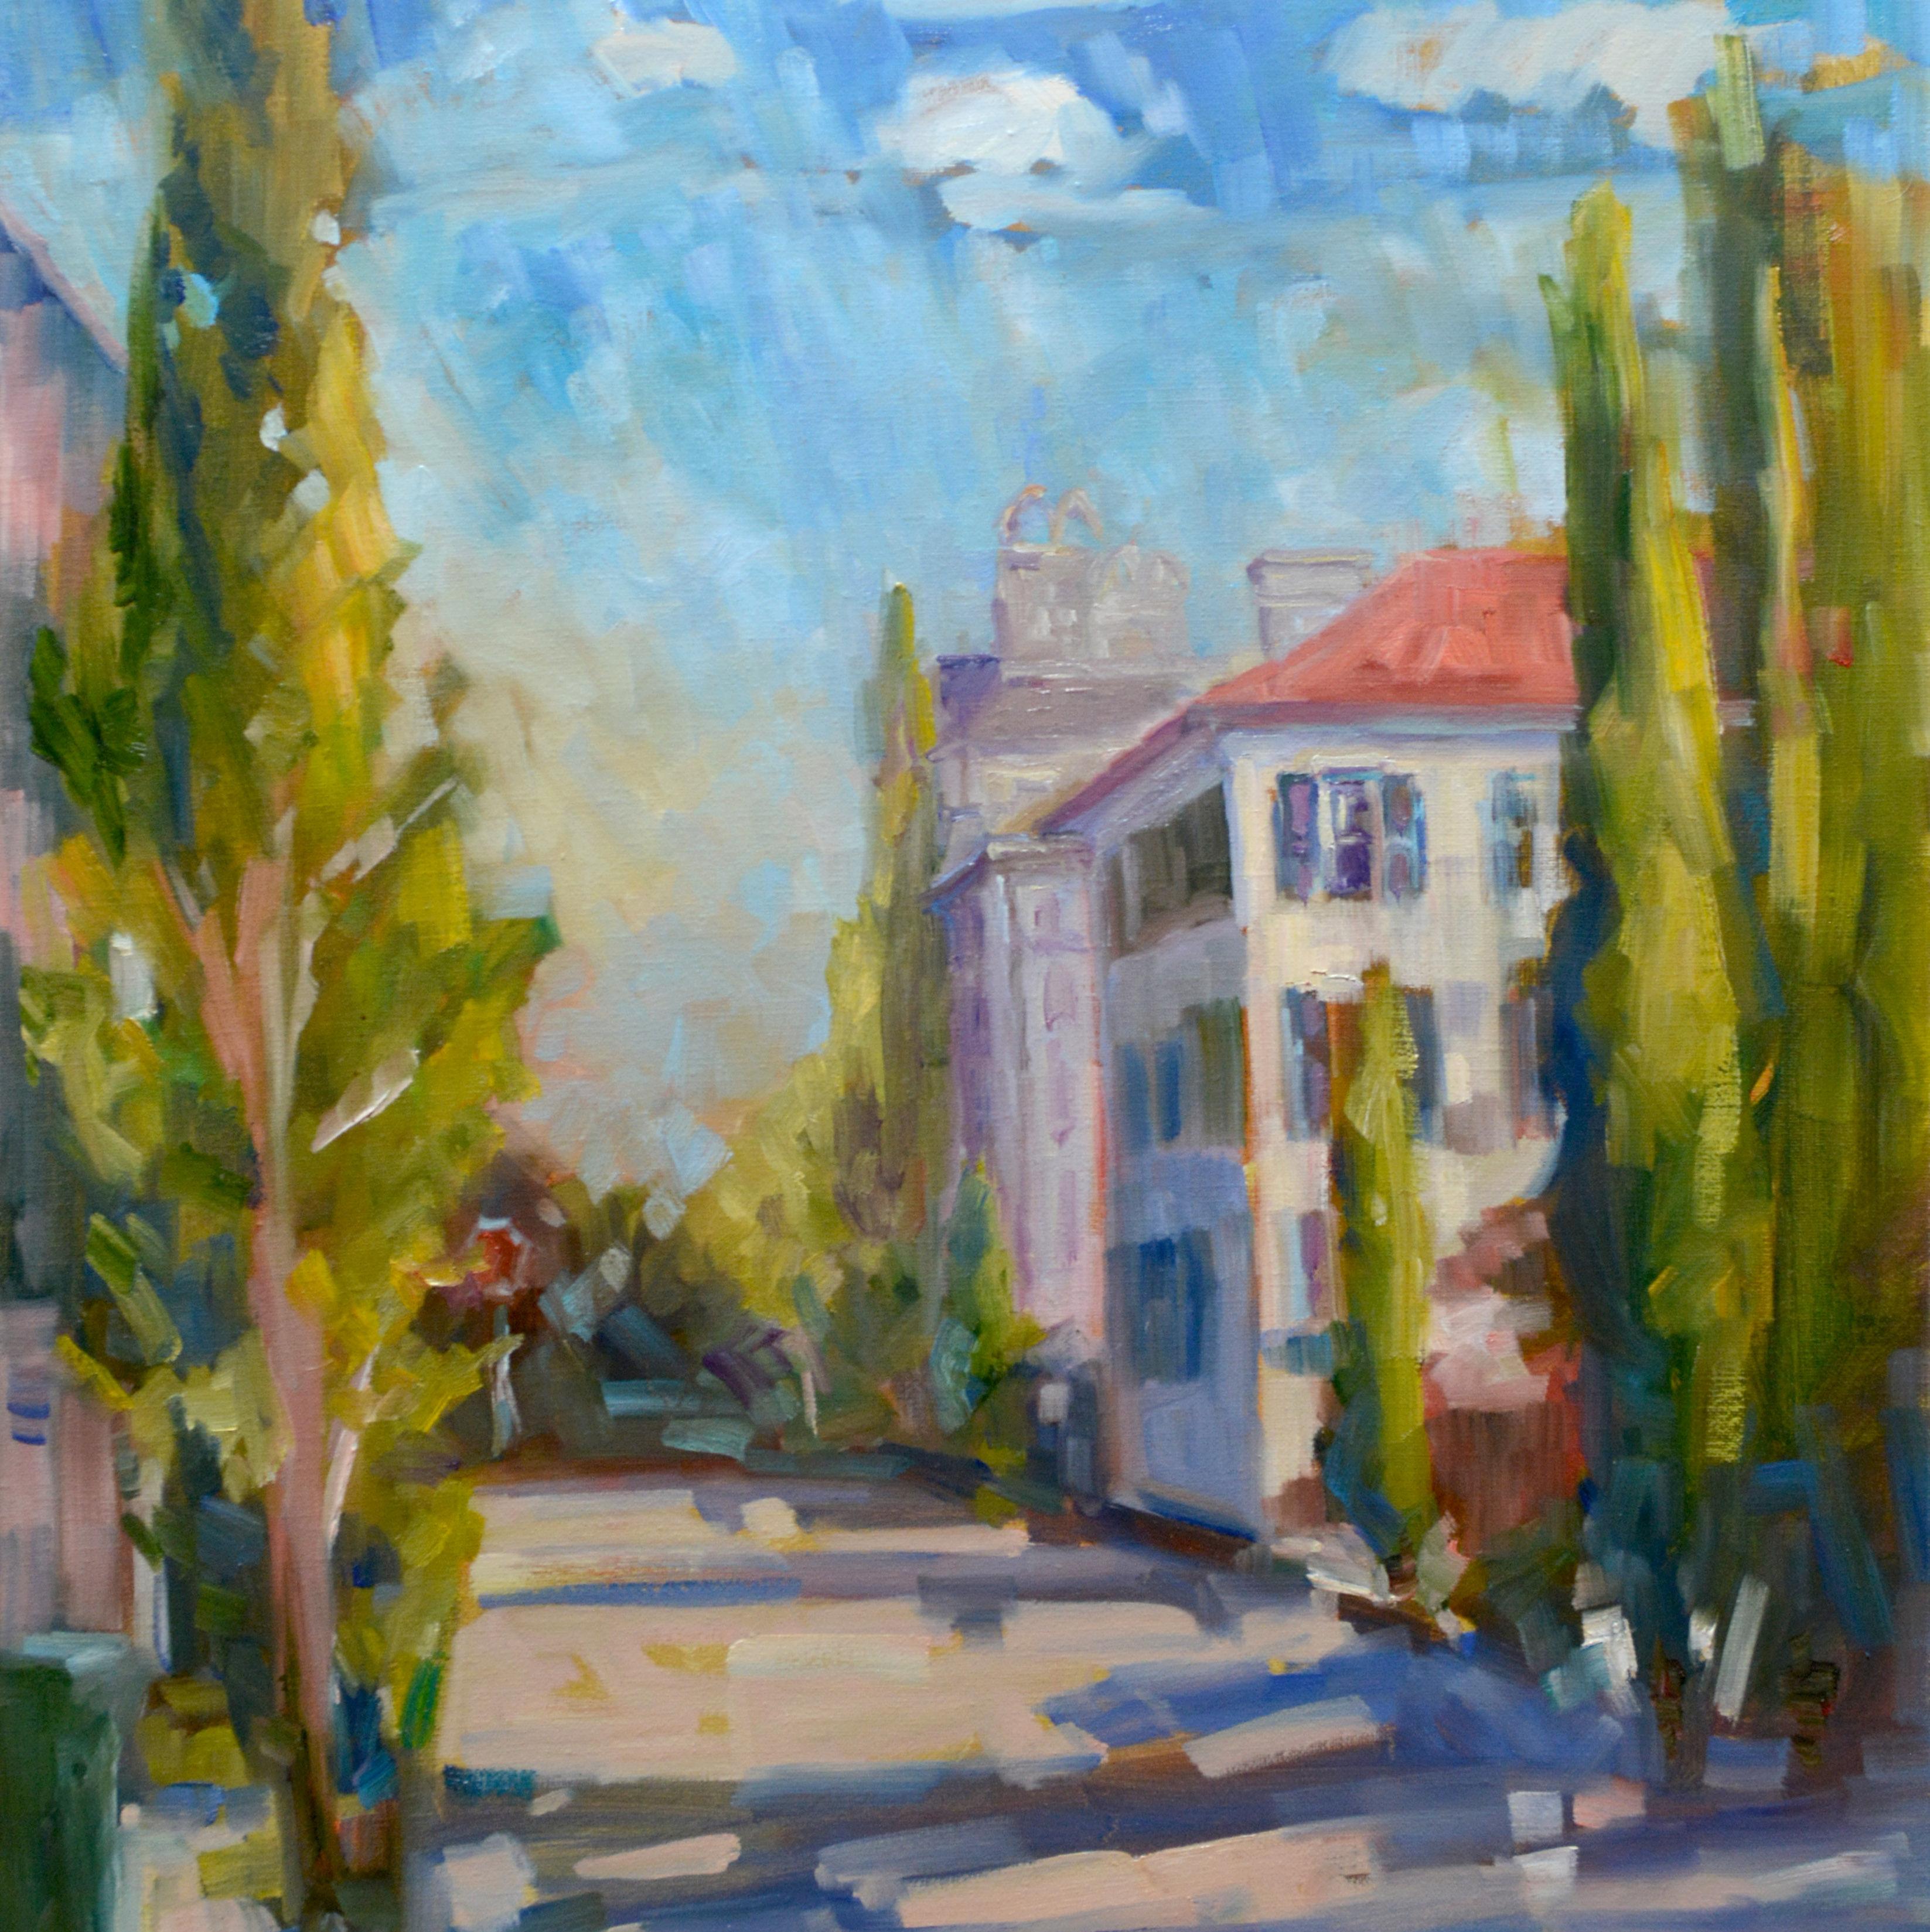 Long View of St Michaels Alley by Karen Hewitt Hagan